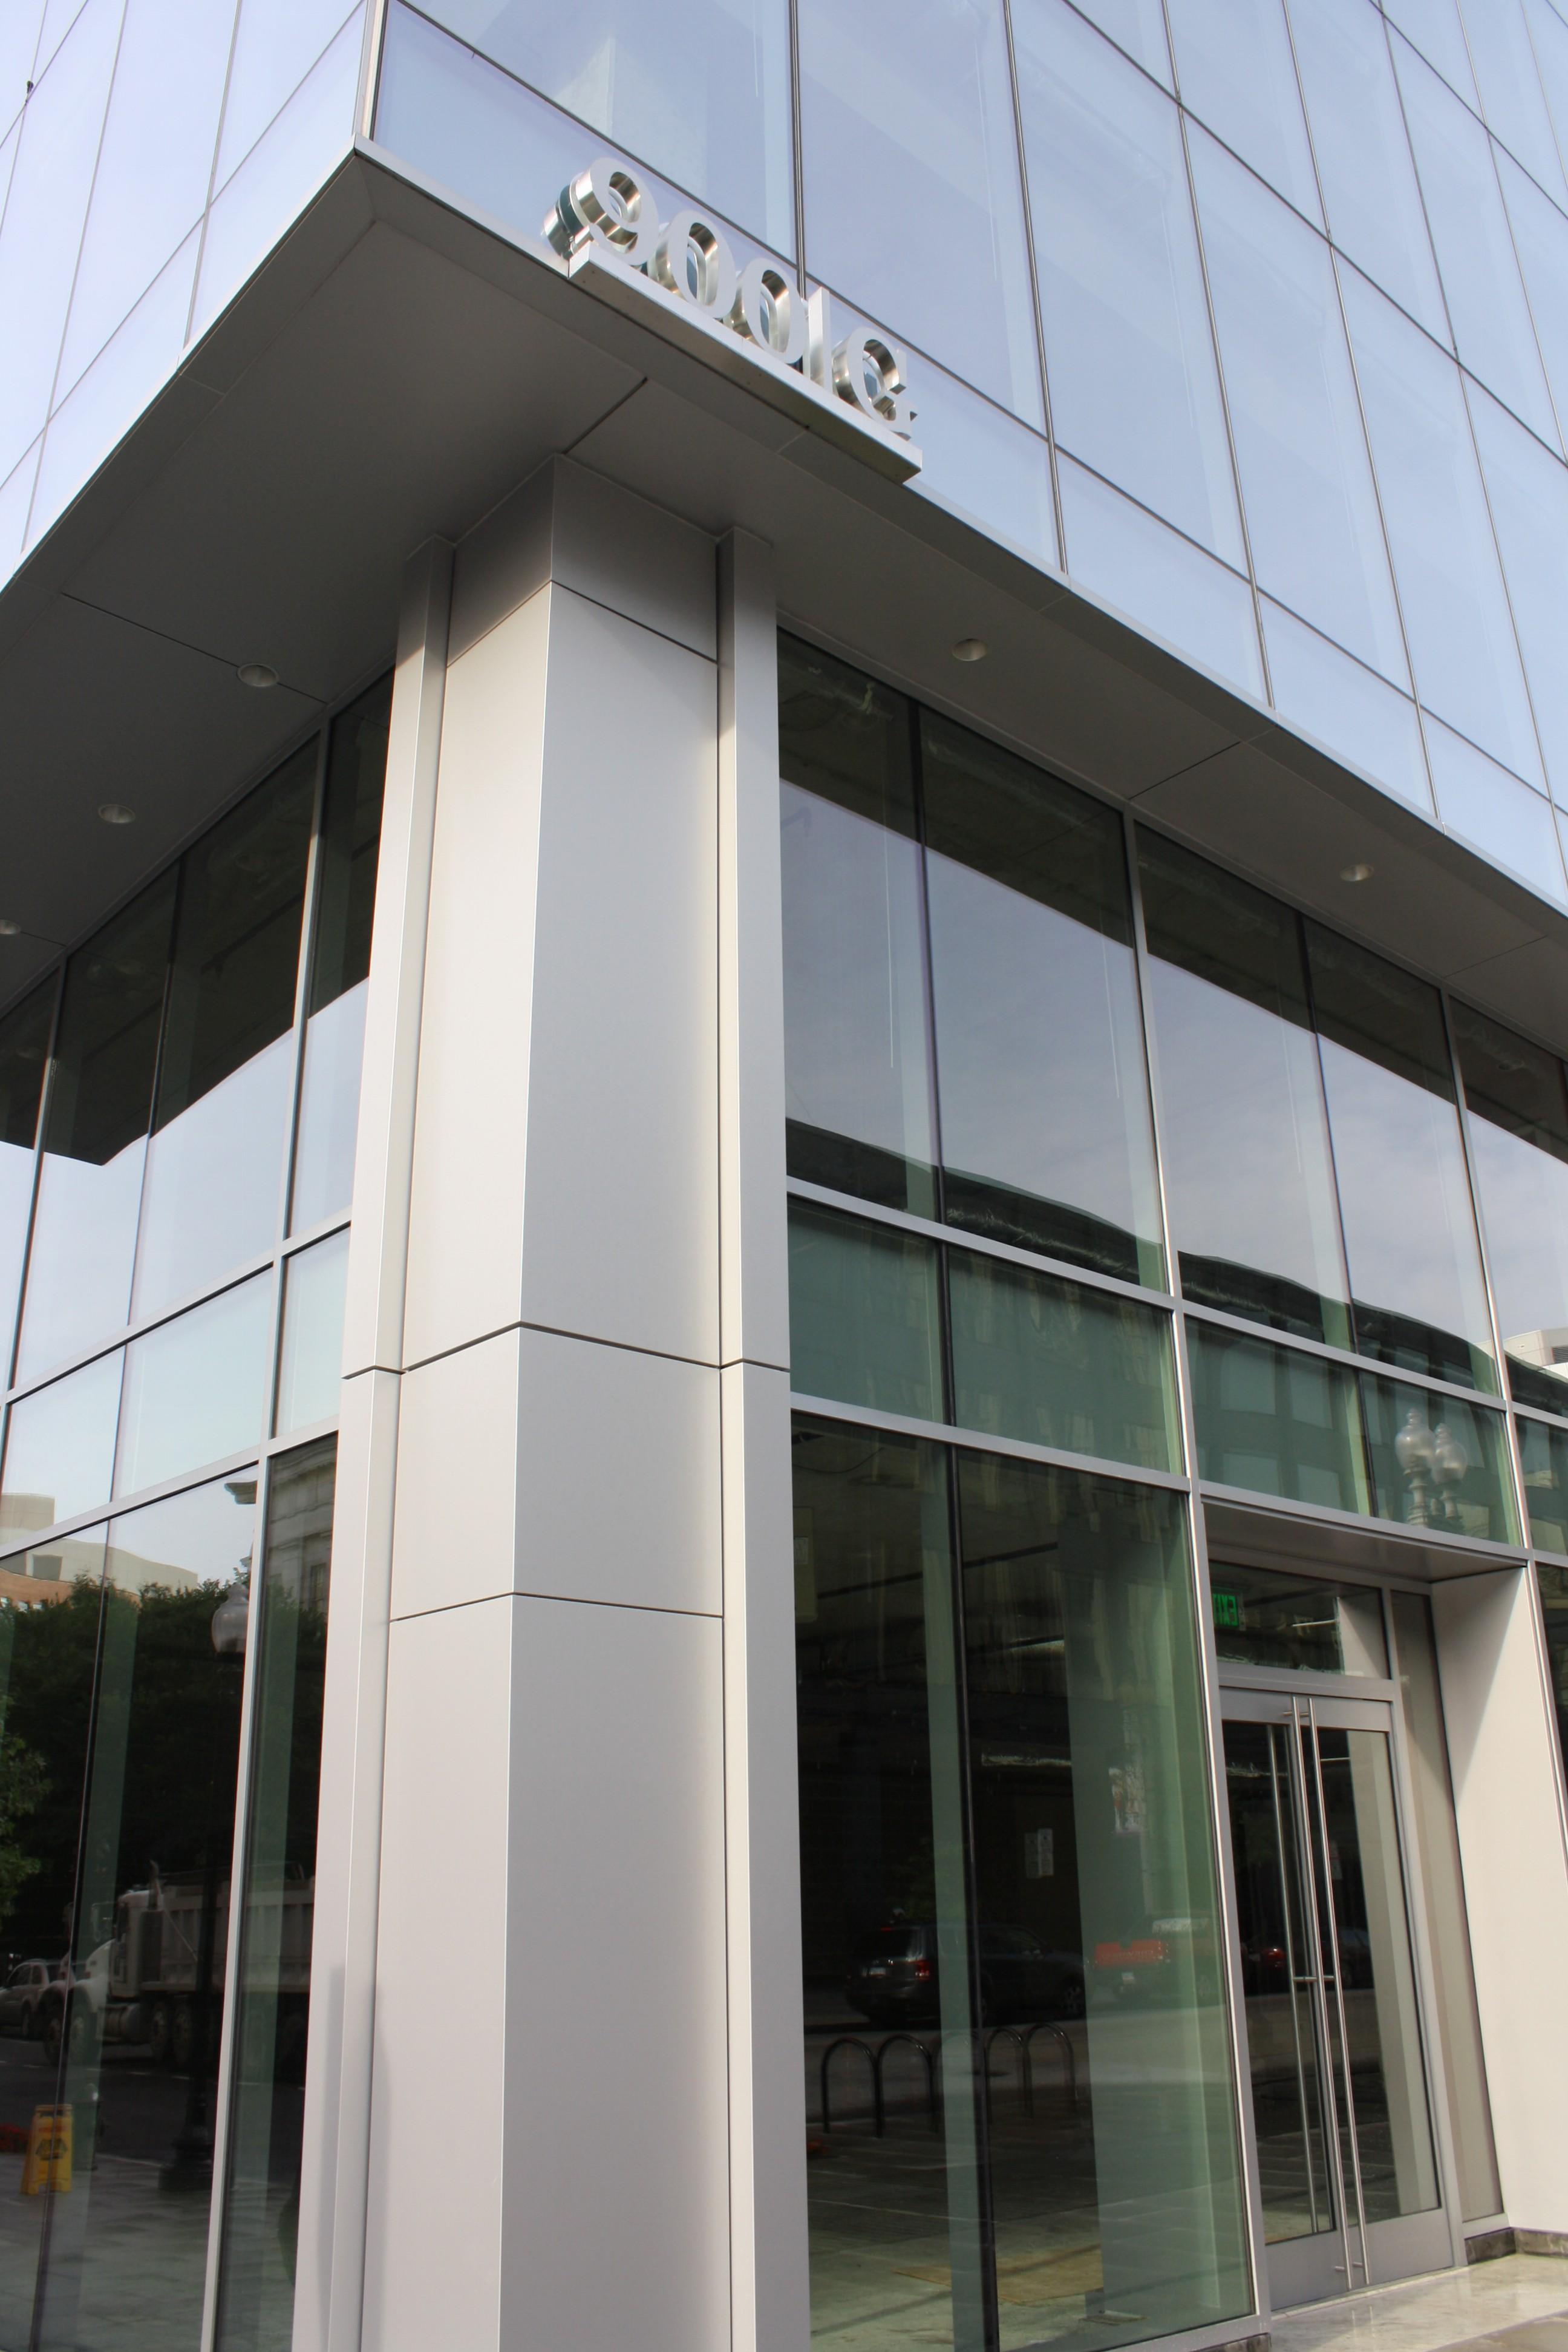 Kia Of Kingsport >> 900 G Street SAF – Southern Aluminum Finishing Co, Inc.